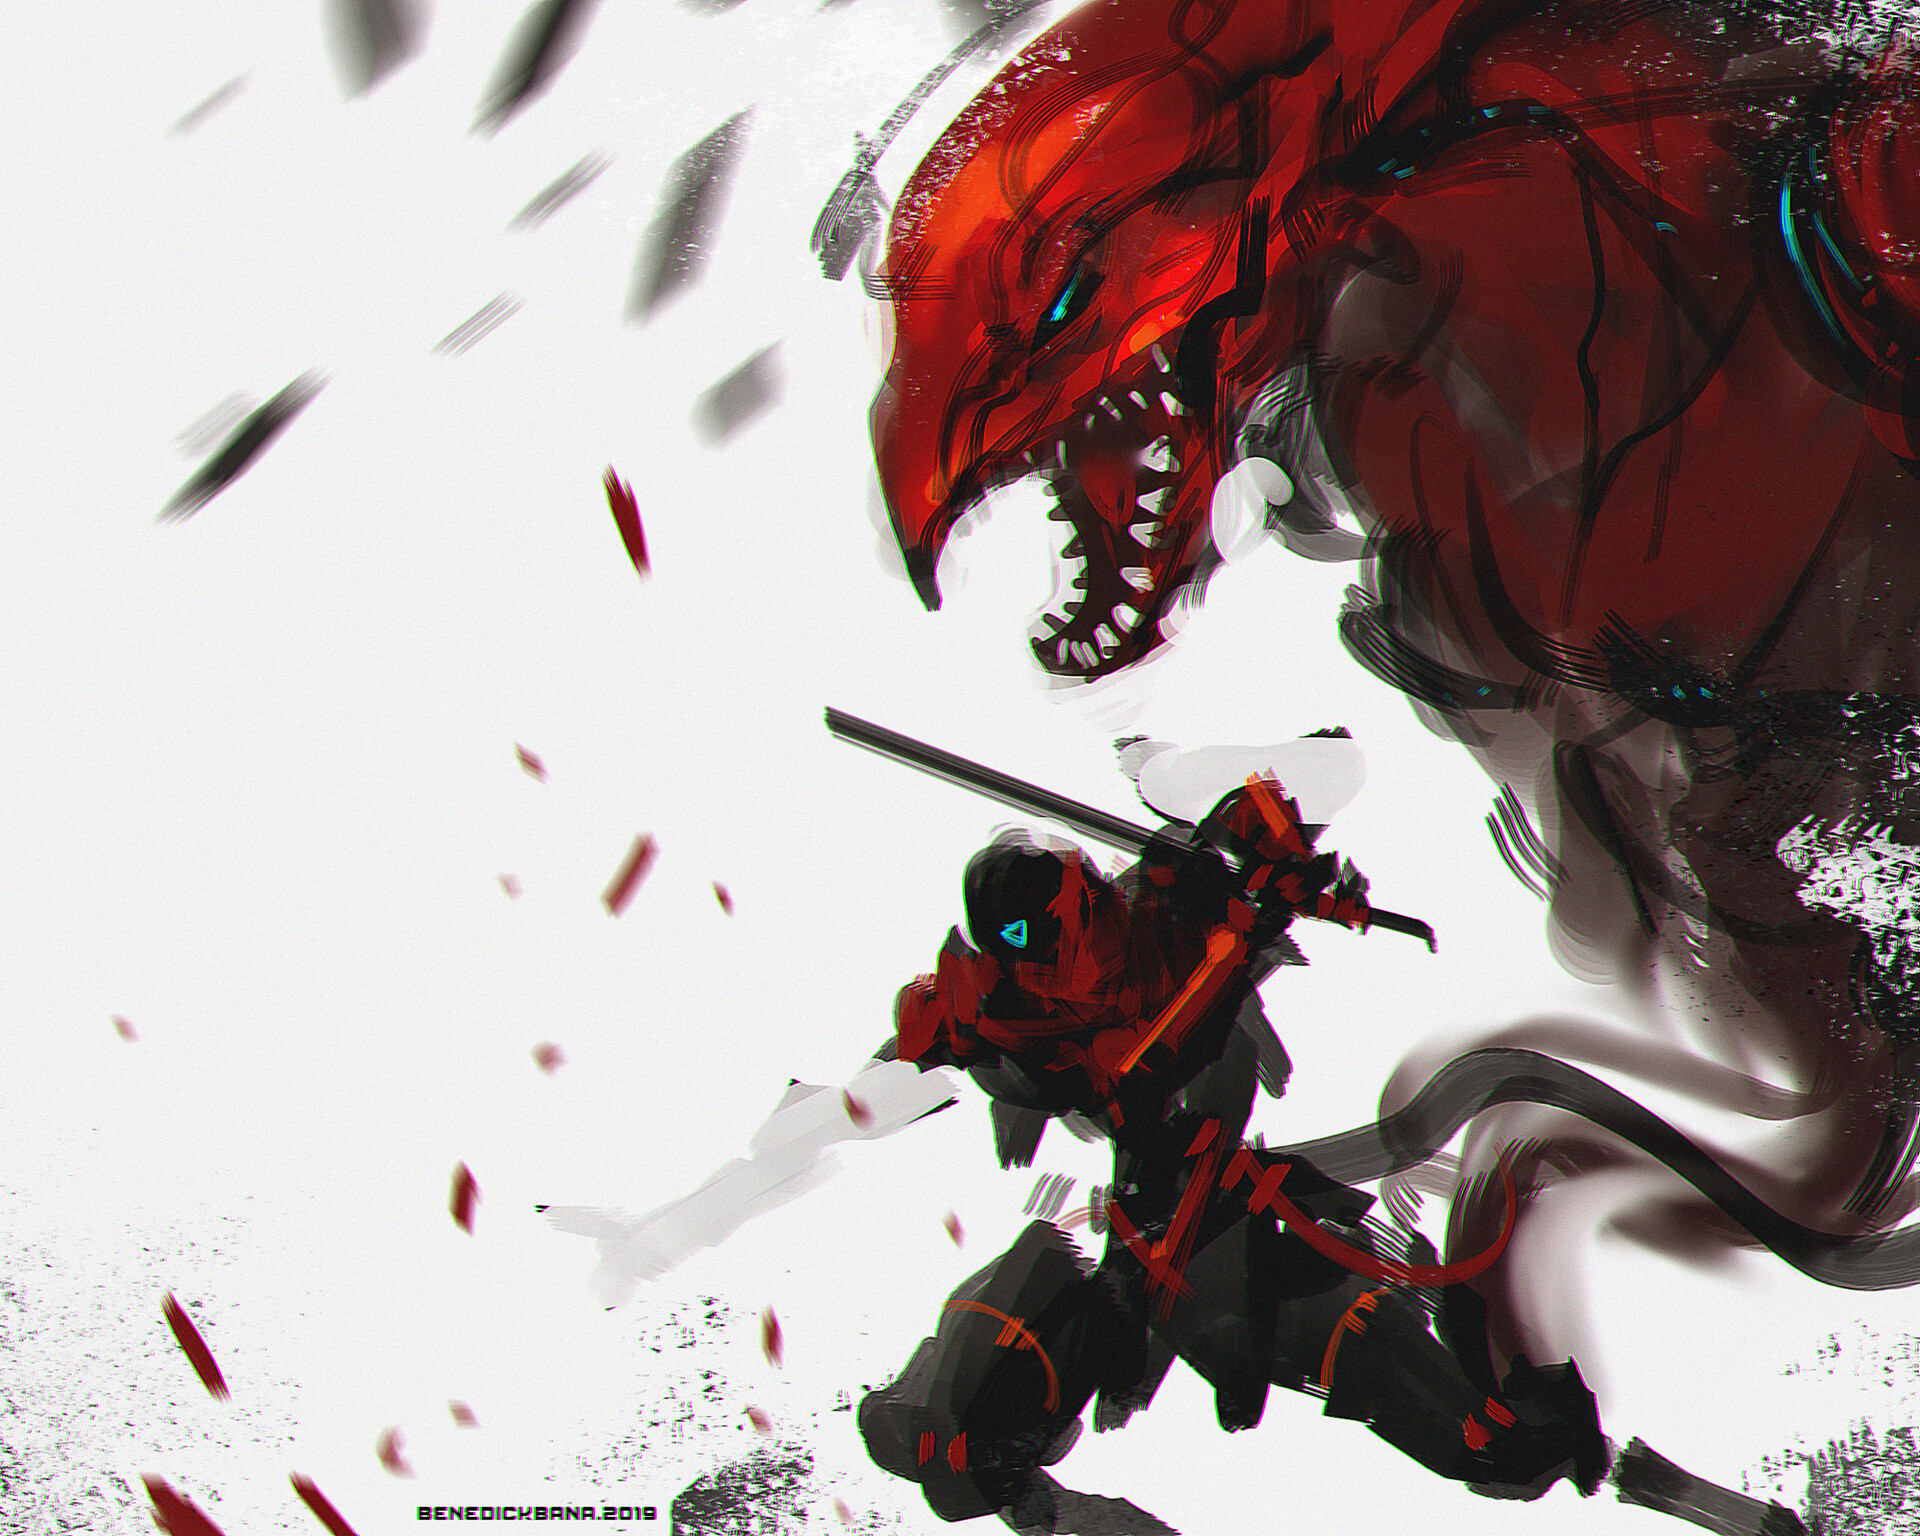 Red Flare Wyvern Summon